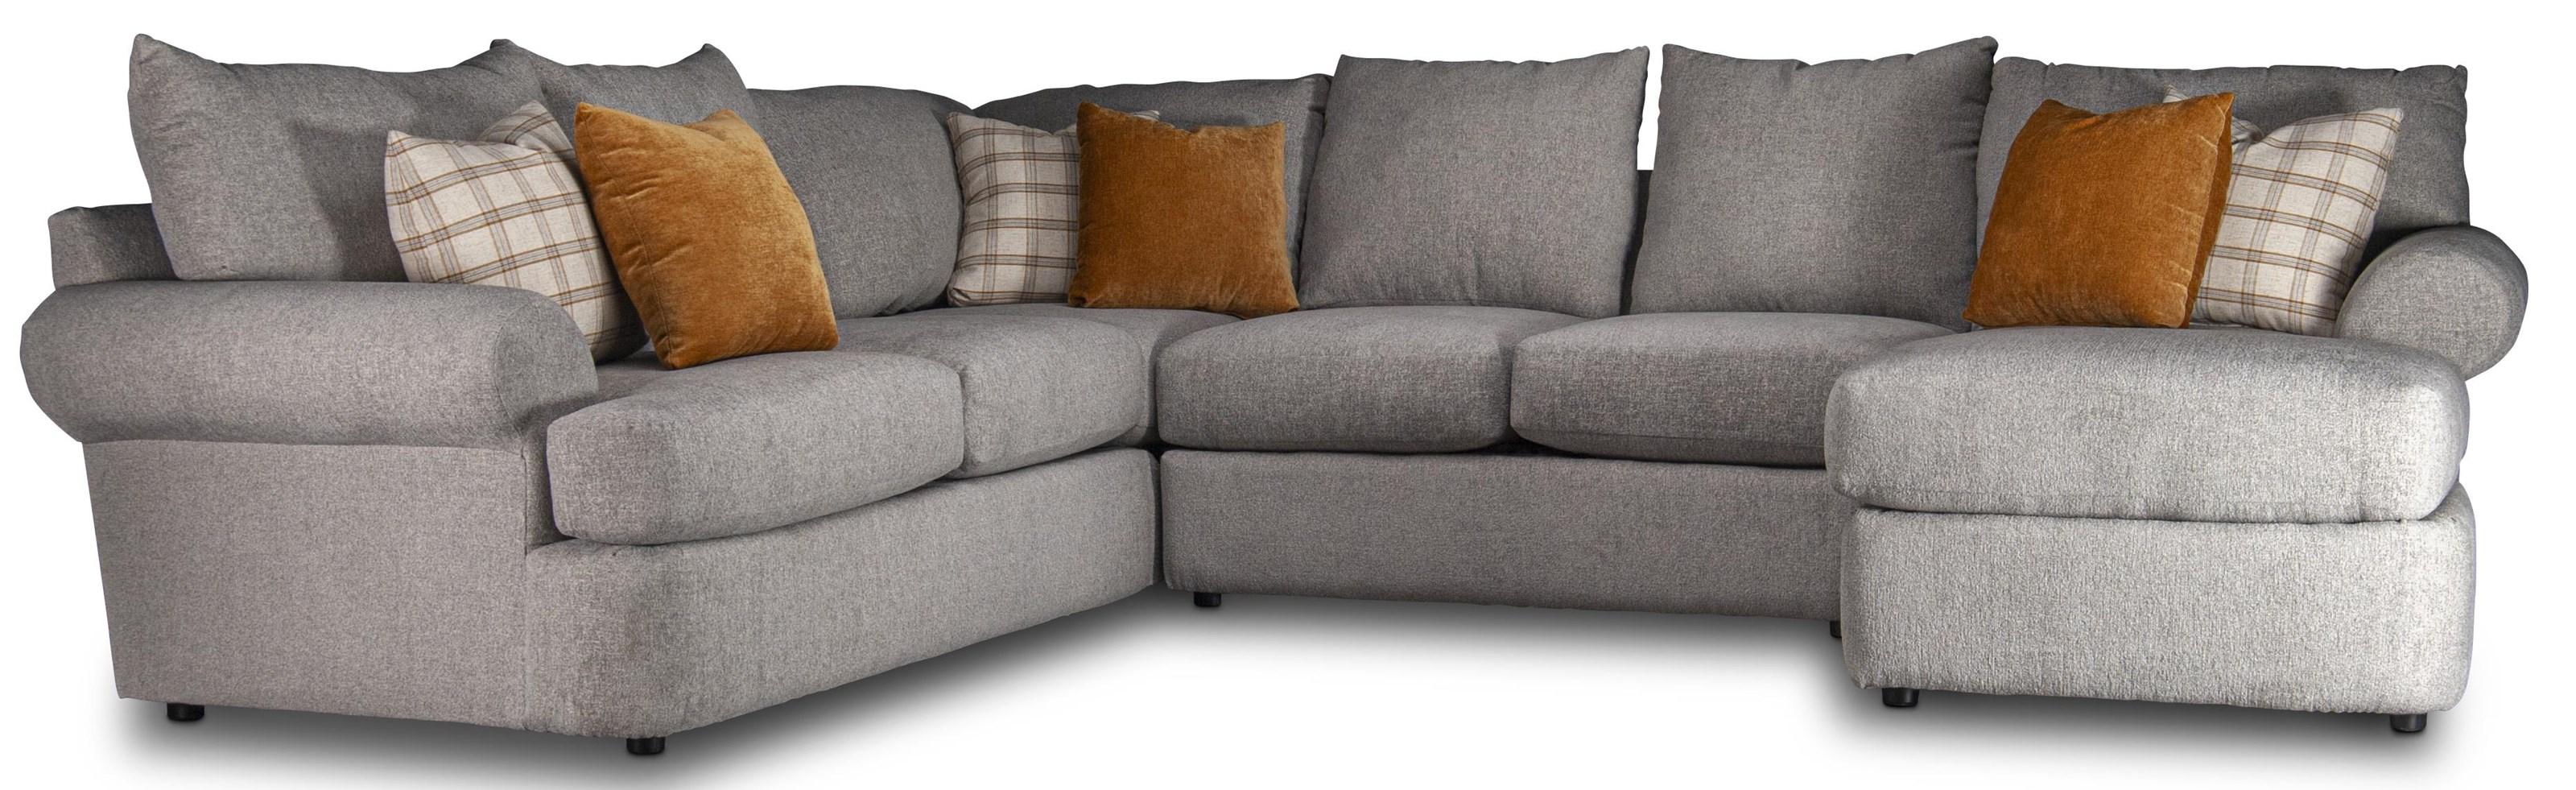 Emmett Emmett Sectional Sofa by Klaussner at Morris Home